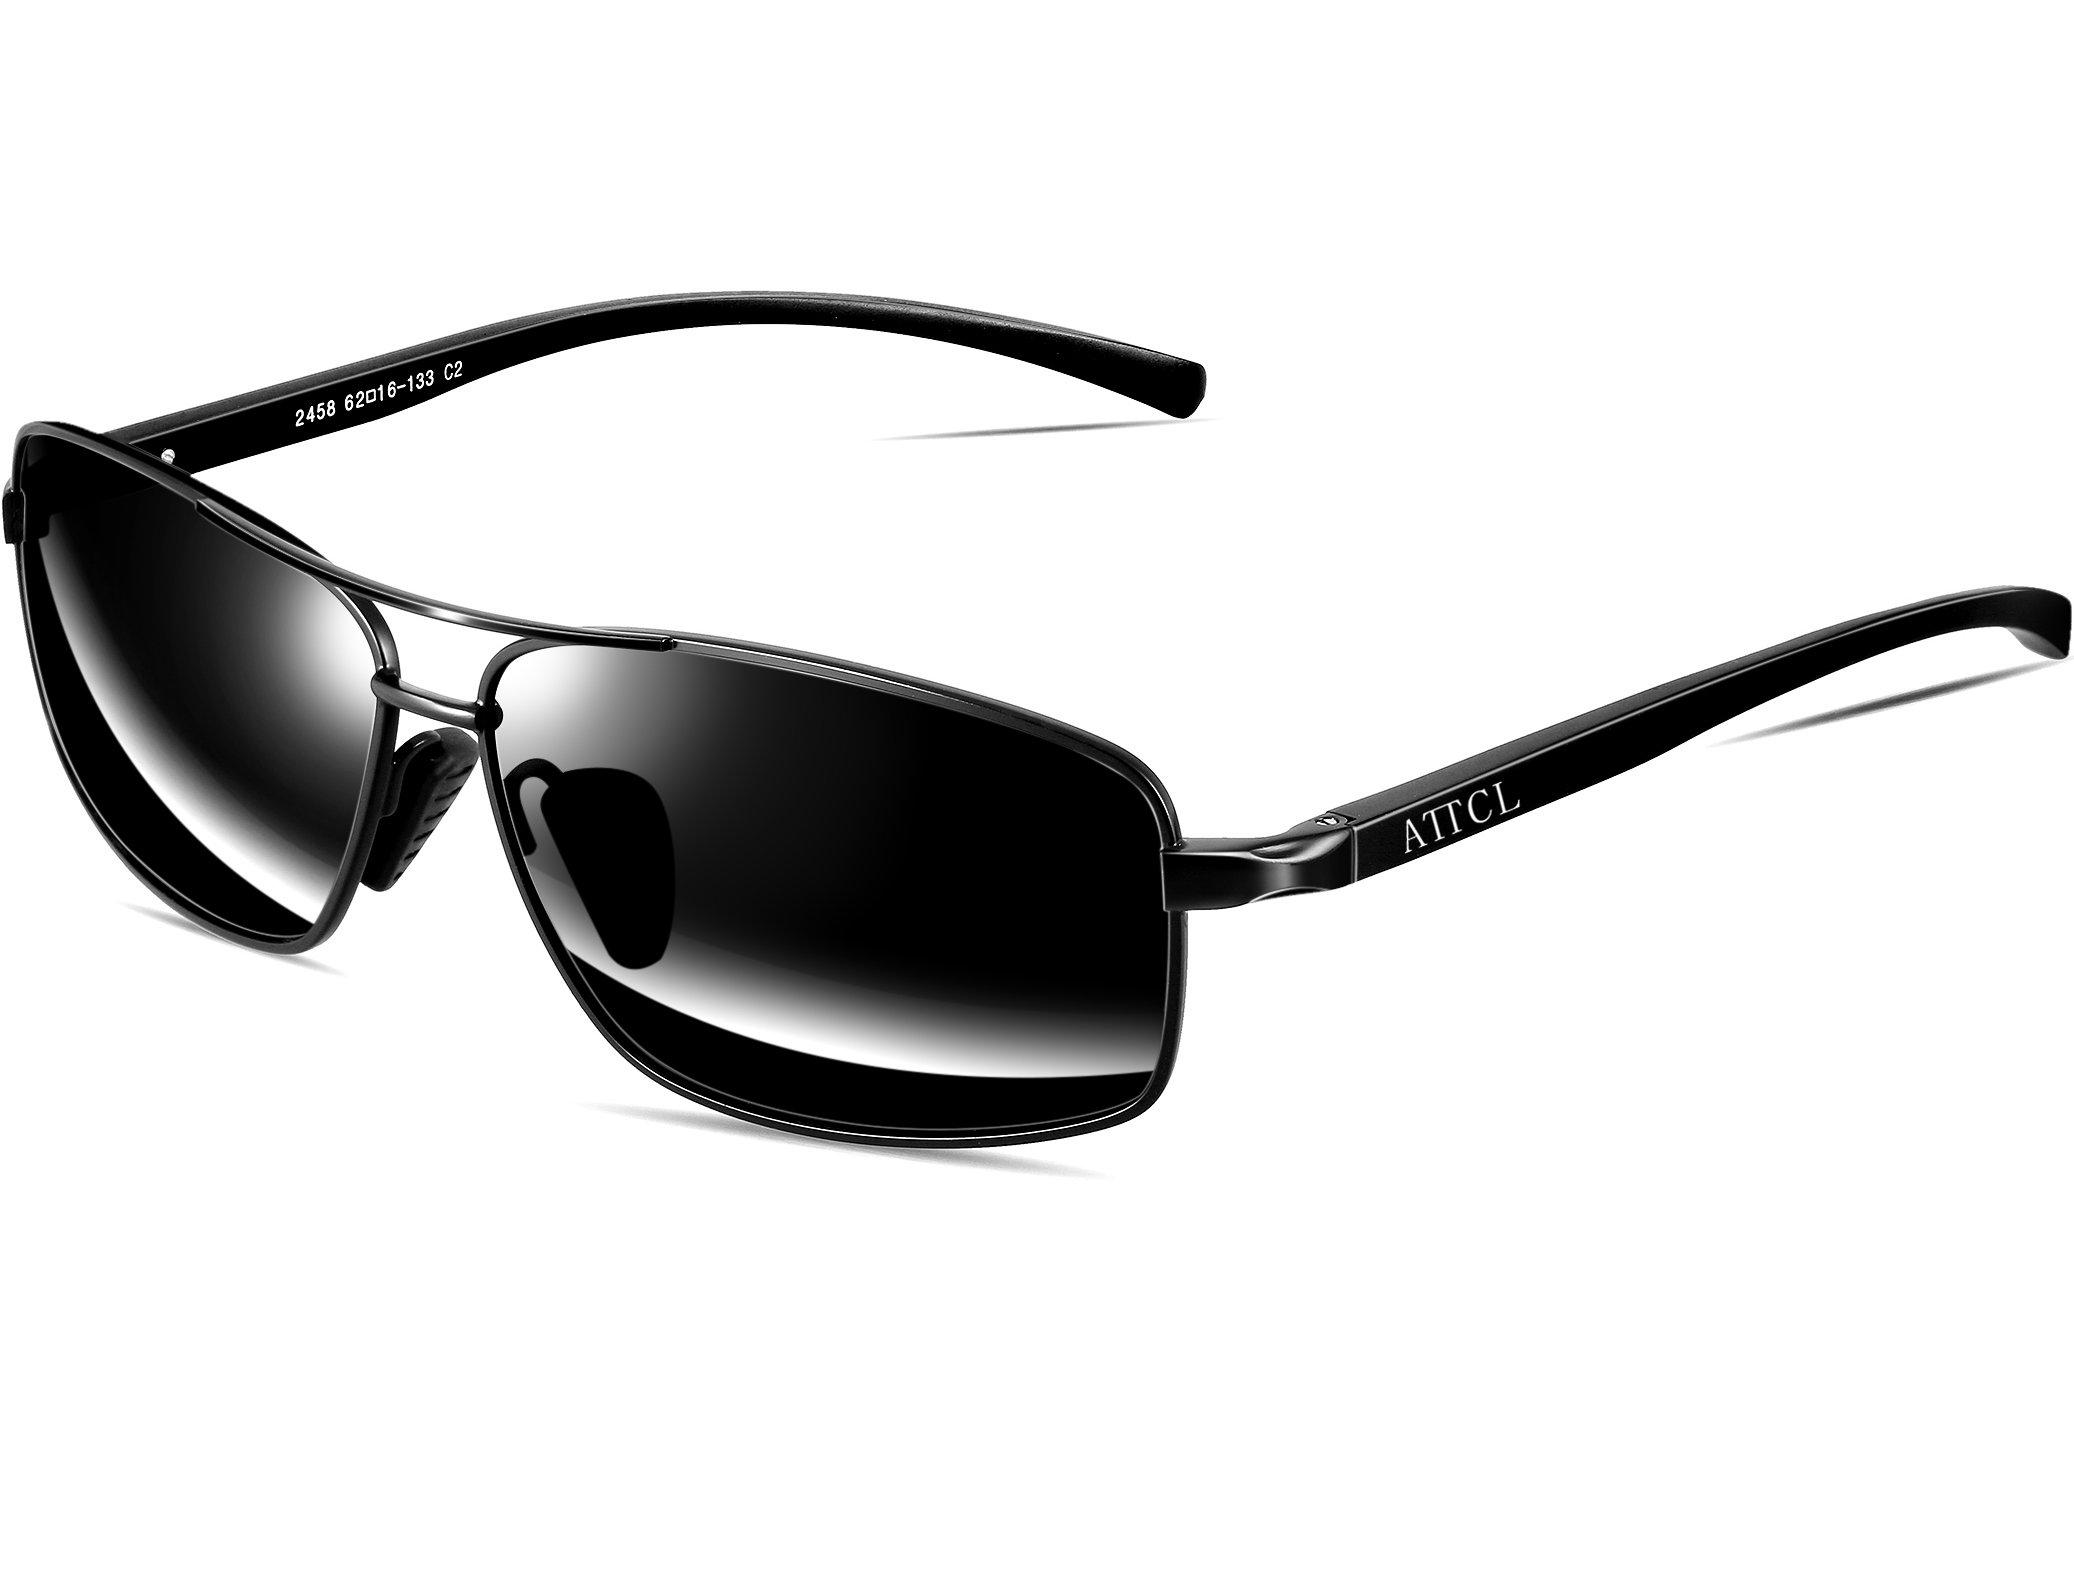 ATTCL Men's Sunglasses Rectangular Driving Polarized Lens Al-Mg metal Frame Ultra-light 2458 Black by ATTCL